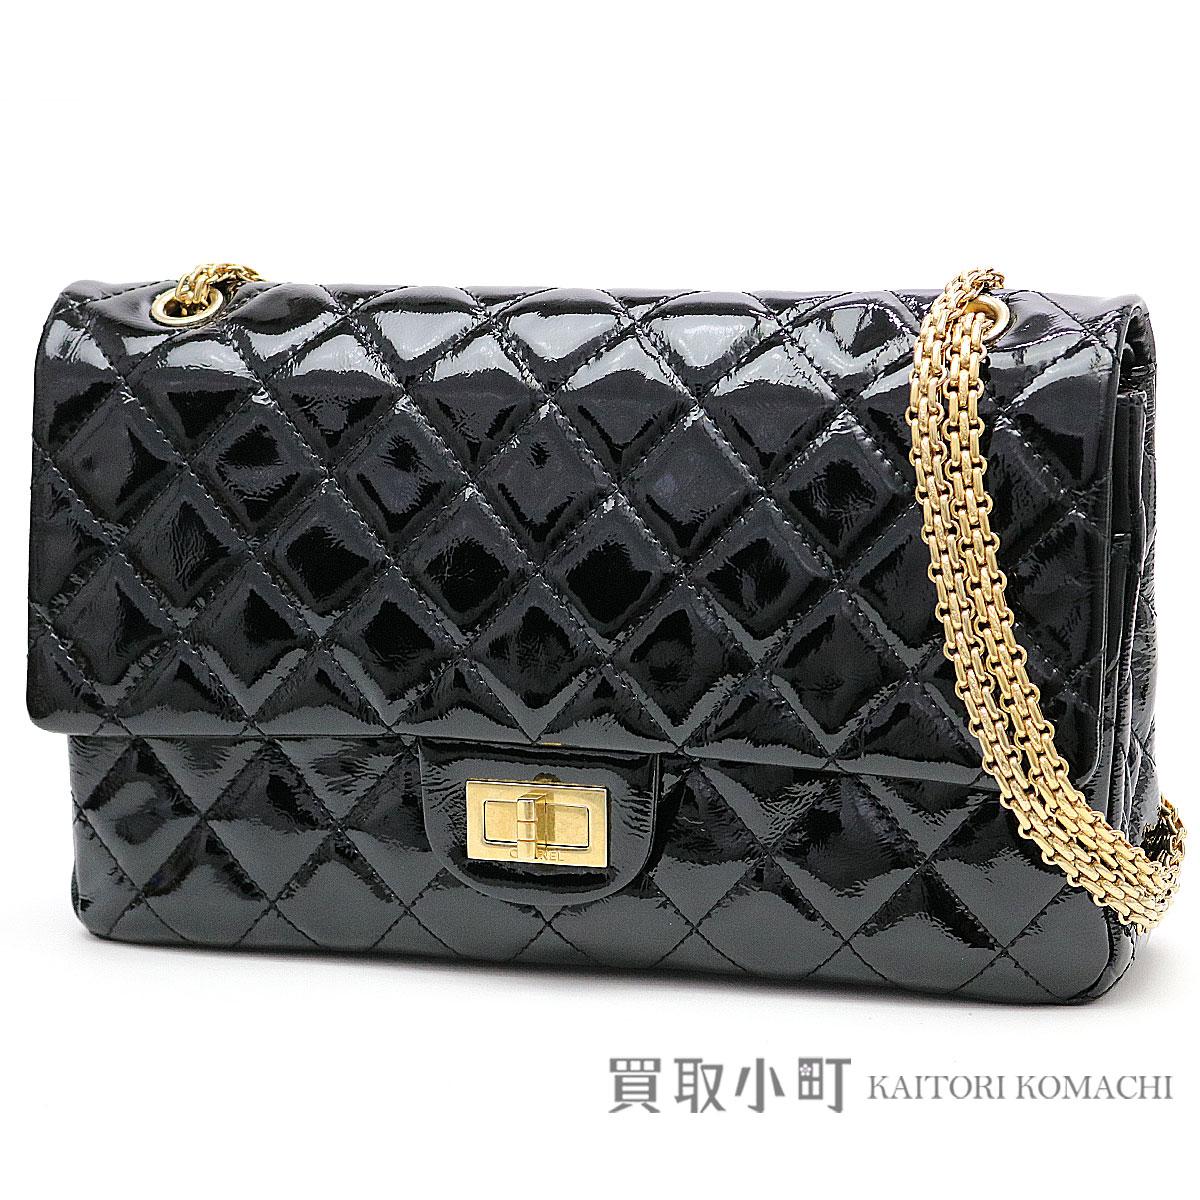 e3679011f296 KAITORIKOMACHI: Chanel maxi handbag 2.55 classical music flap bag large black  patent leather W chain shoulder bag matelasse double flap double-cover ...